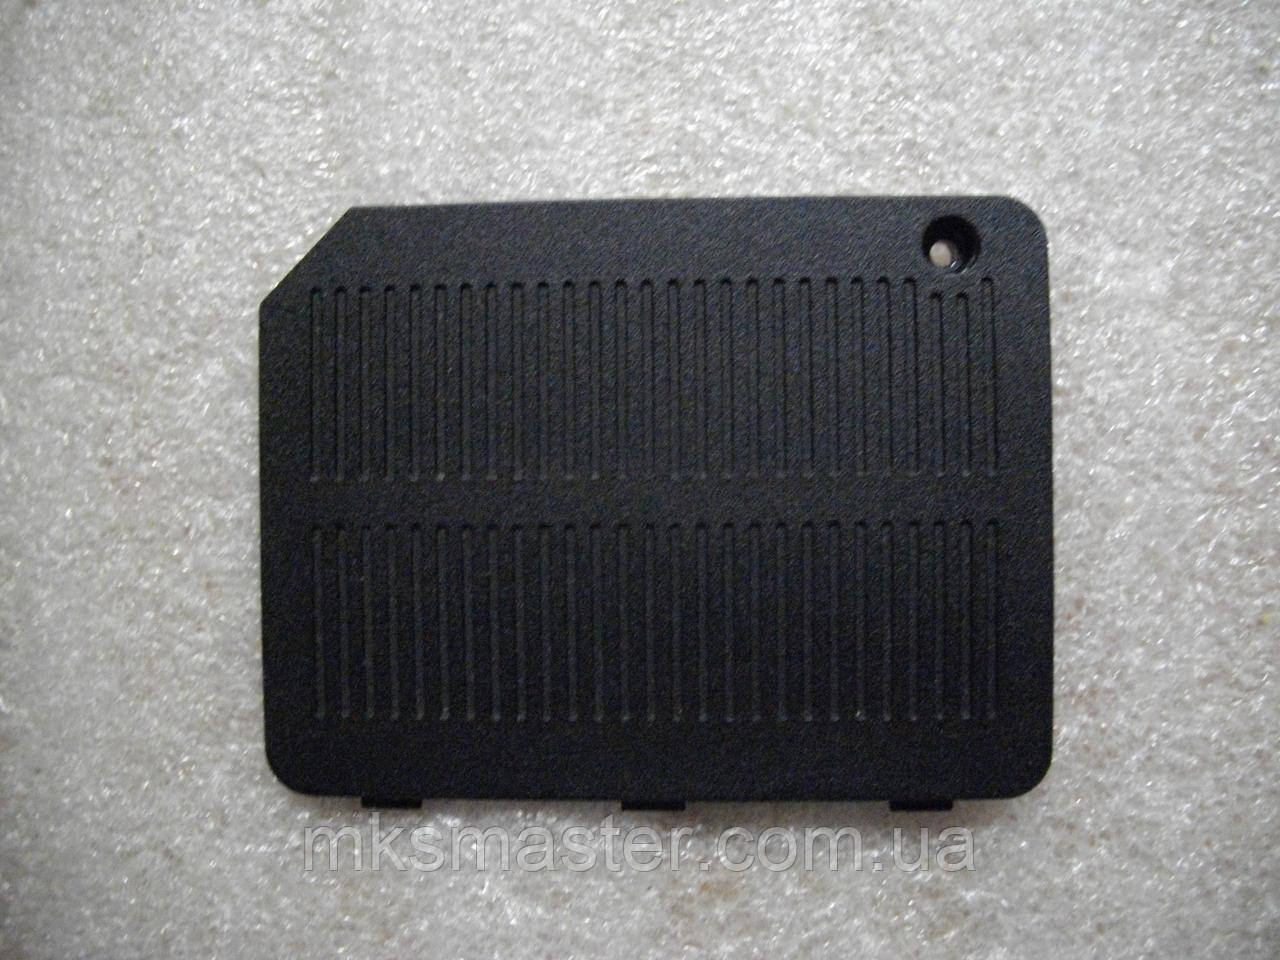 Сервисная Крышка RAM Люк Корпус от ноутбука Acer Aspire 5 A515-41G A515-41G-T53G бу